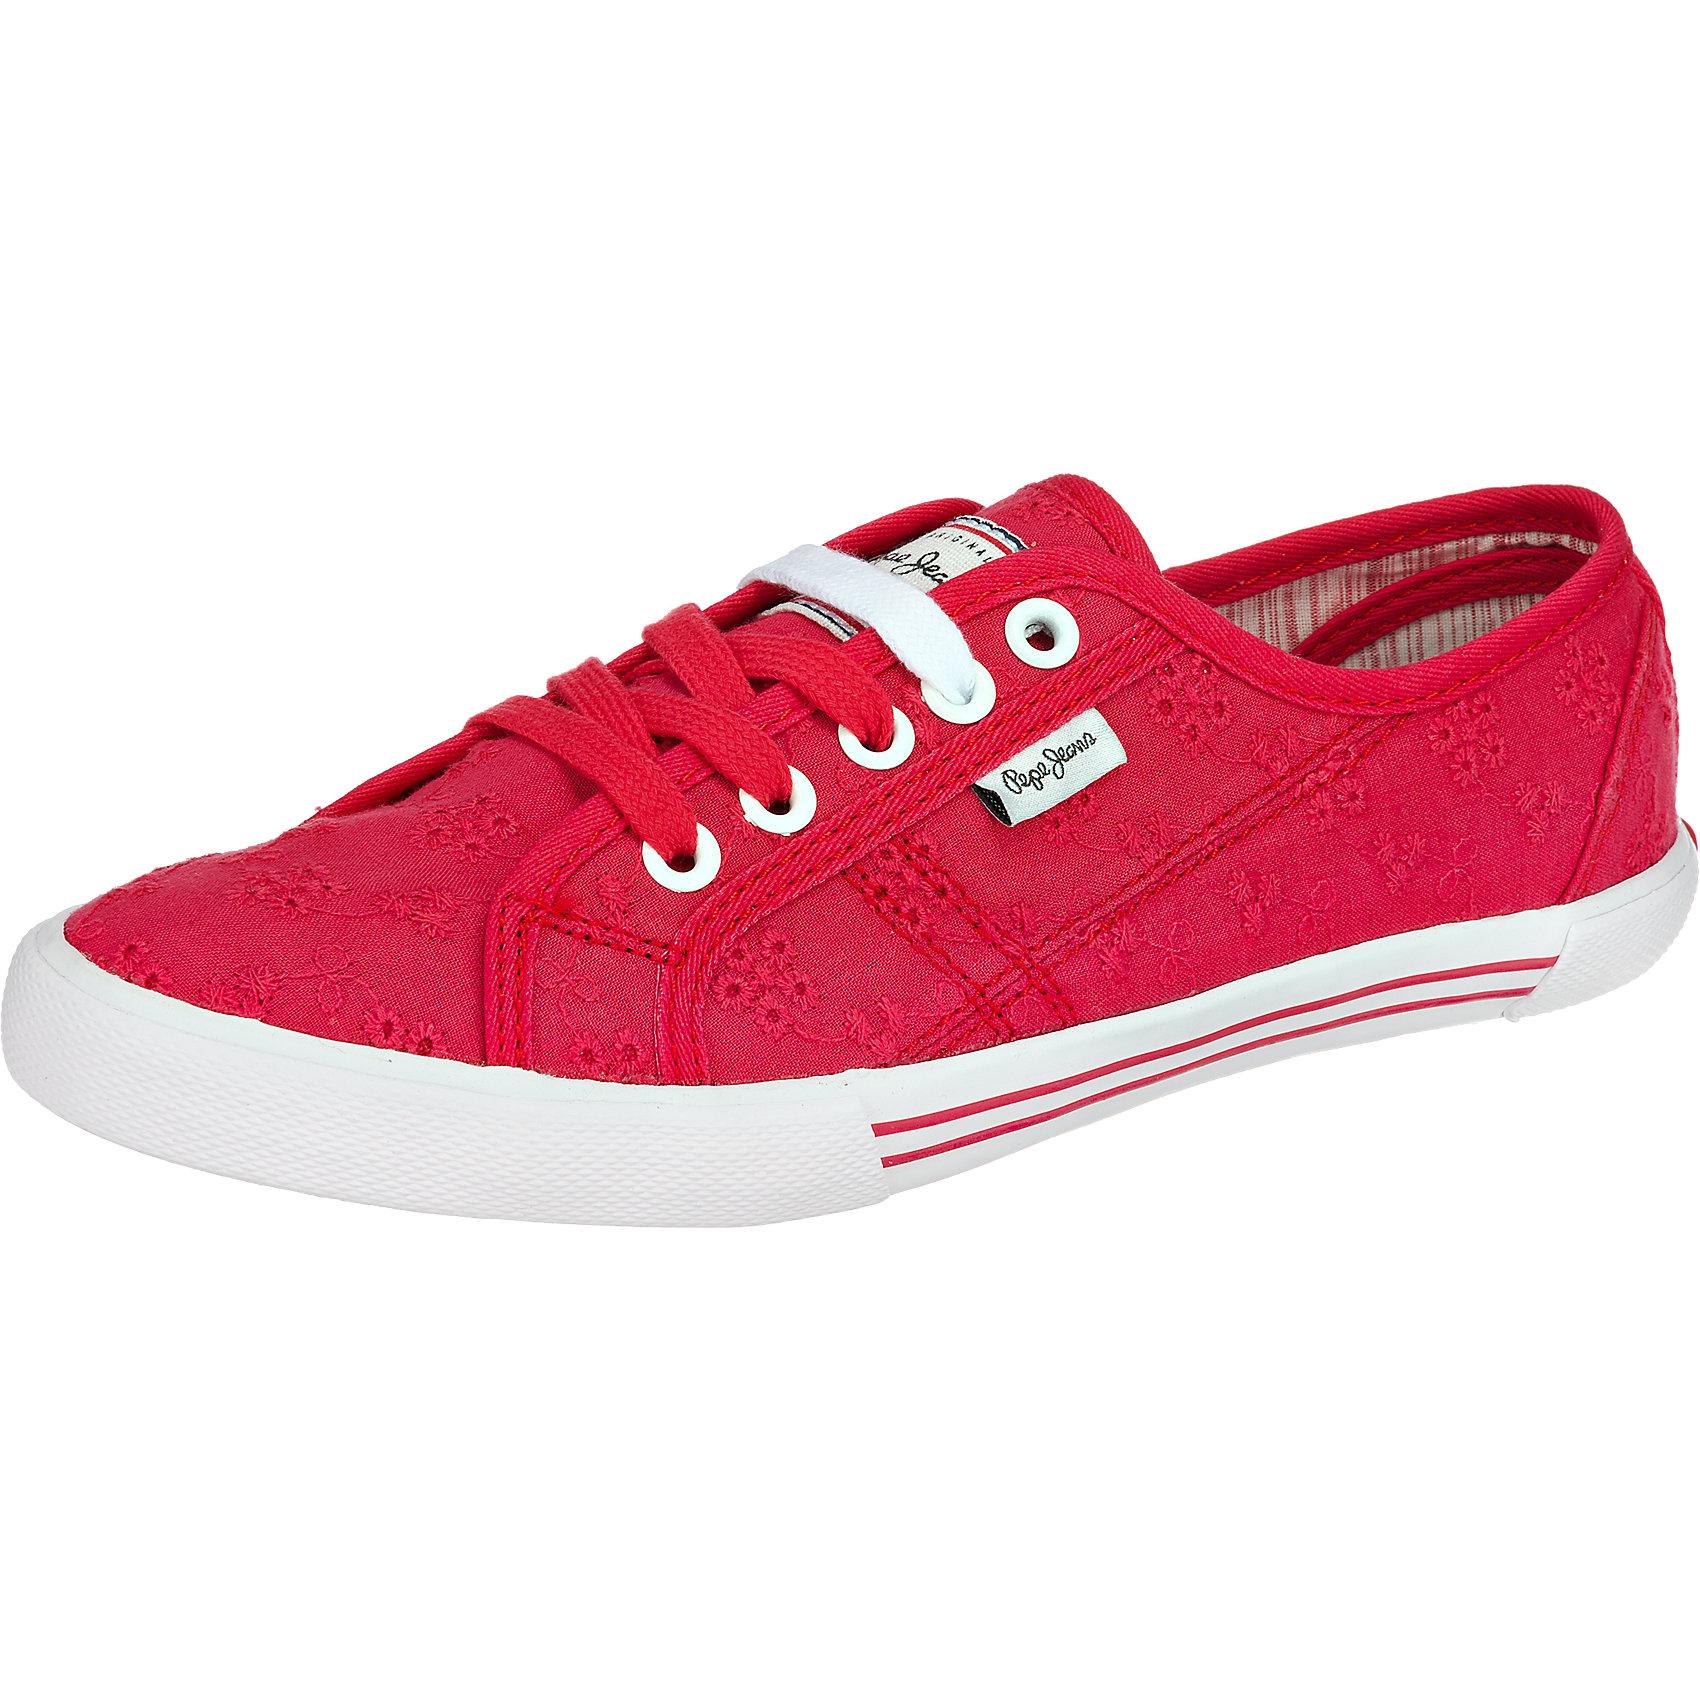 Neu Pepe Jeans Aberlady rot 5769758 Anglaise 17 Sneakers rot Aberlady 5769758 7ea954